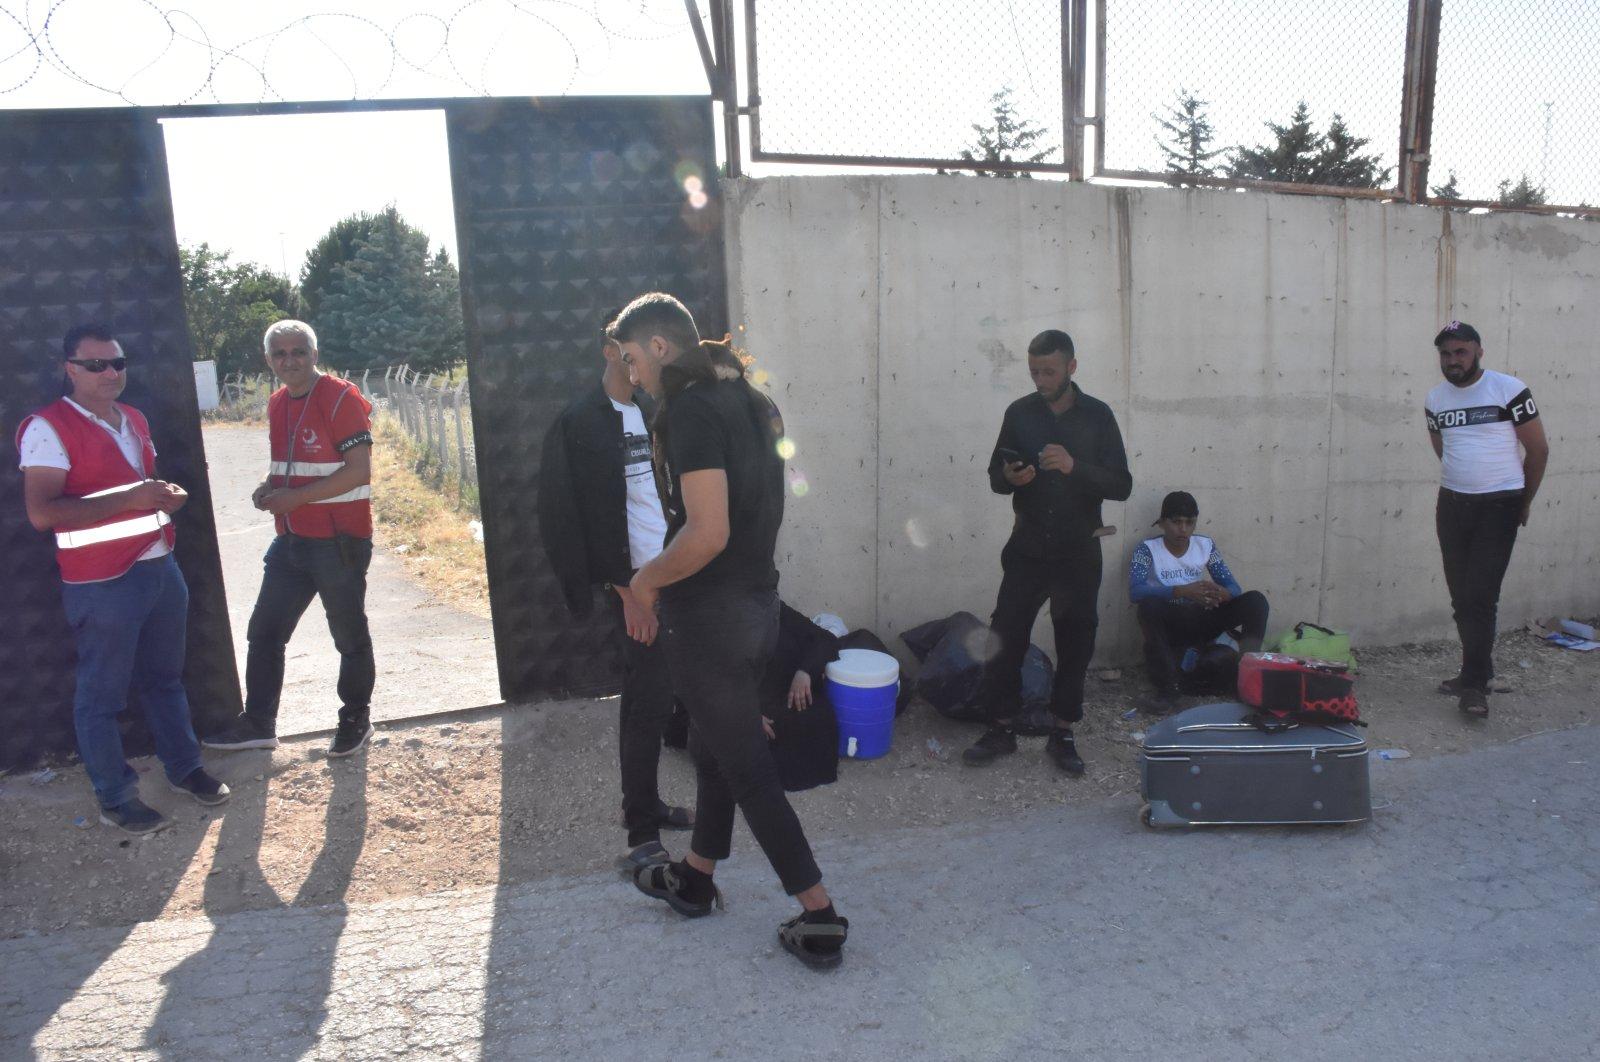 Syrians crossing to see their relatives ahead of Eid al-Adha via the Öncüpınar Border Gate in Turkey's southeastern province of Kilis, Turkey, July 7, 2021. (AA Photo)